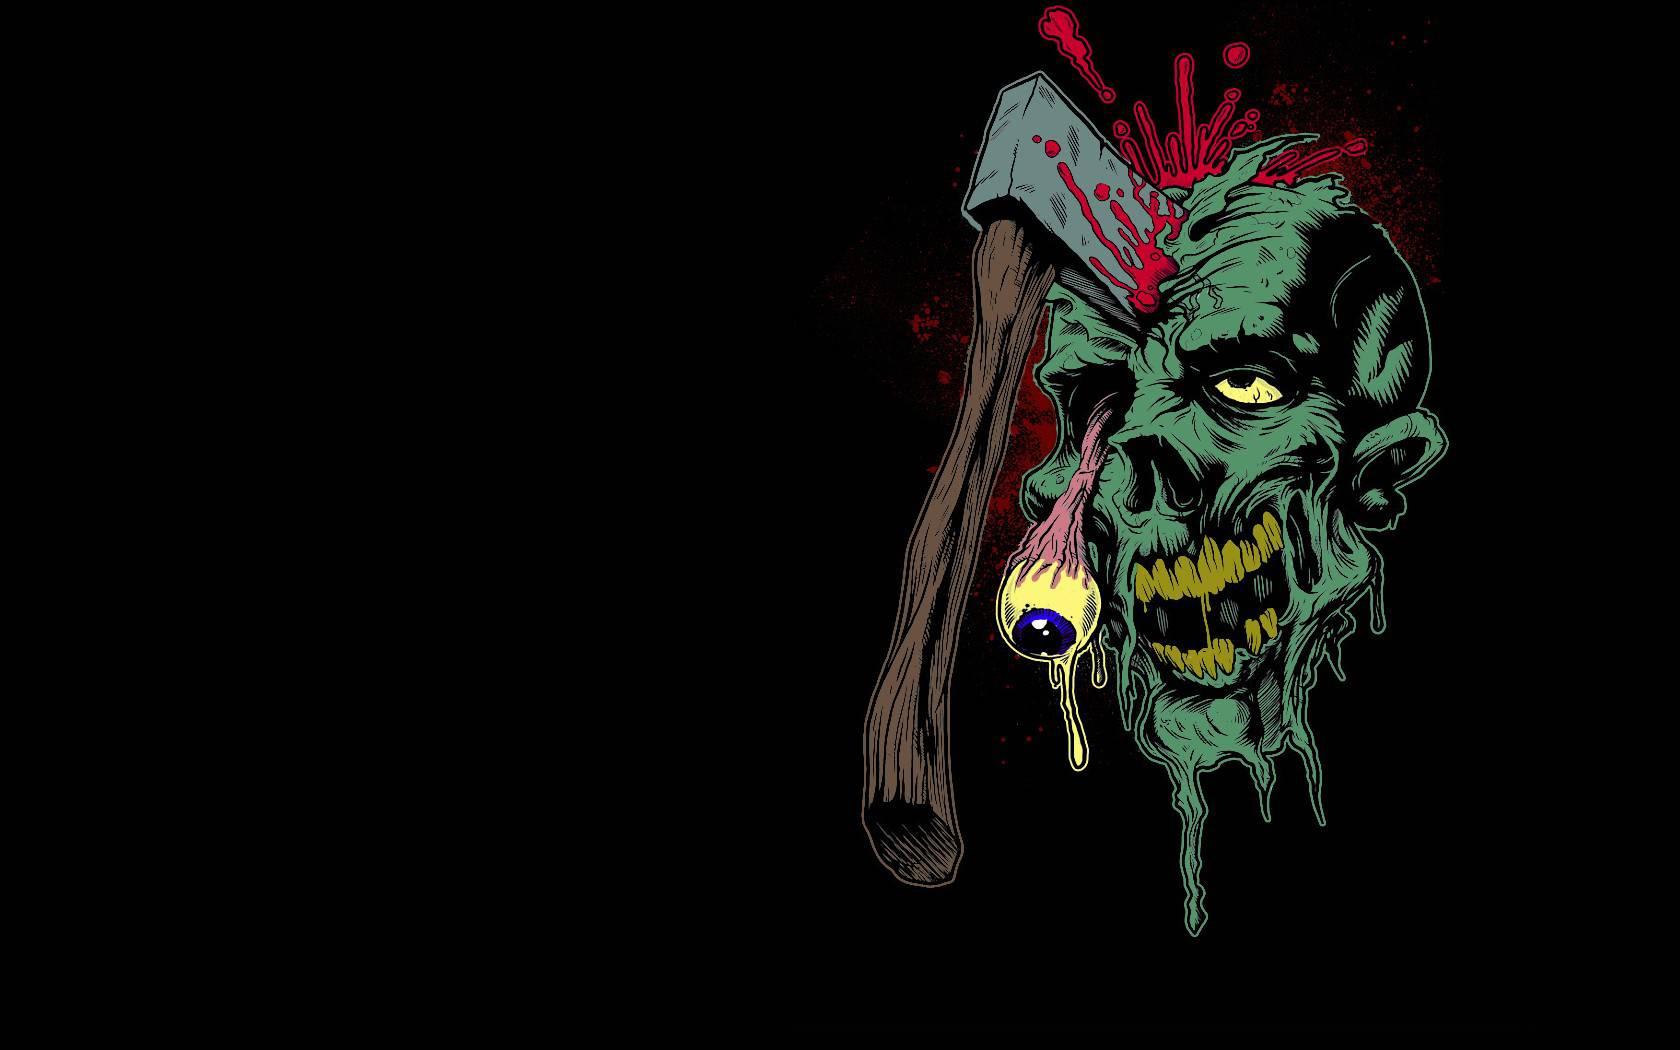 Hd Wallpapers For Desktop Zombie